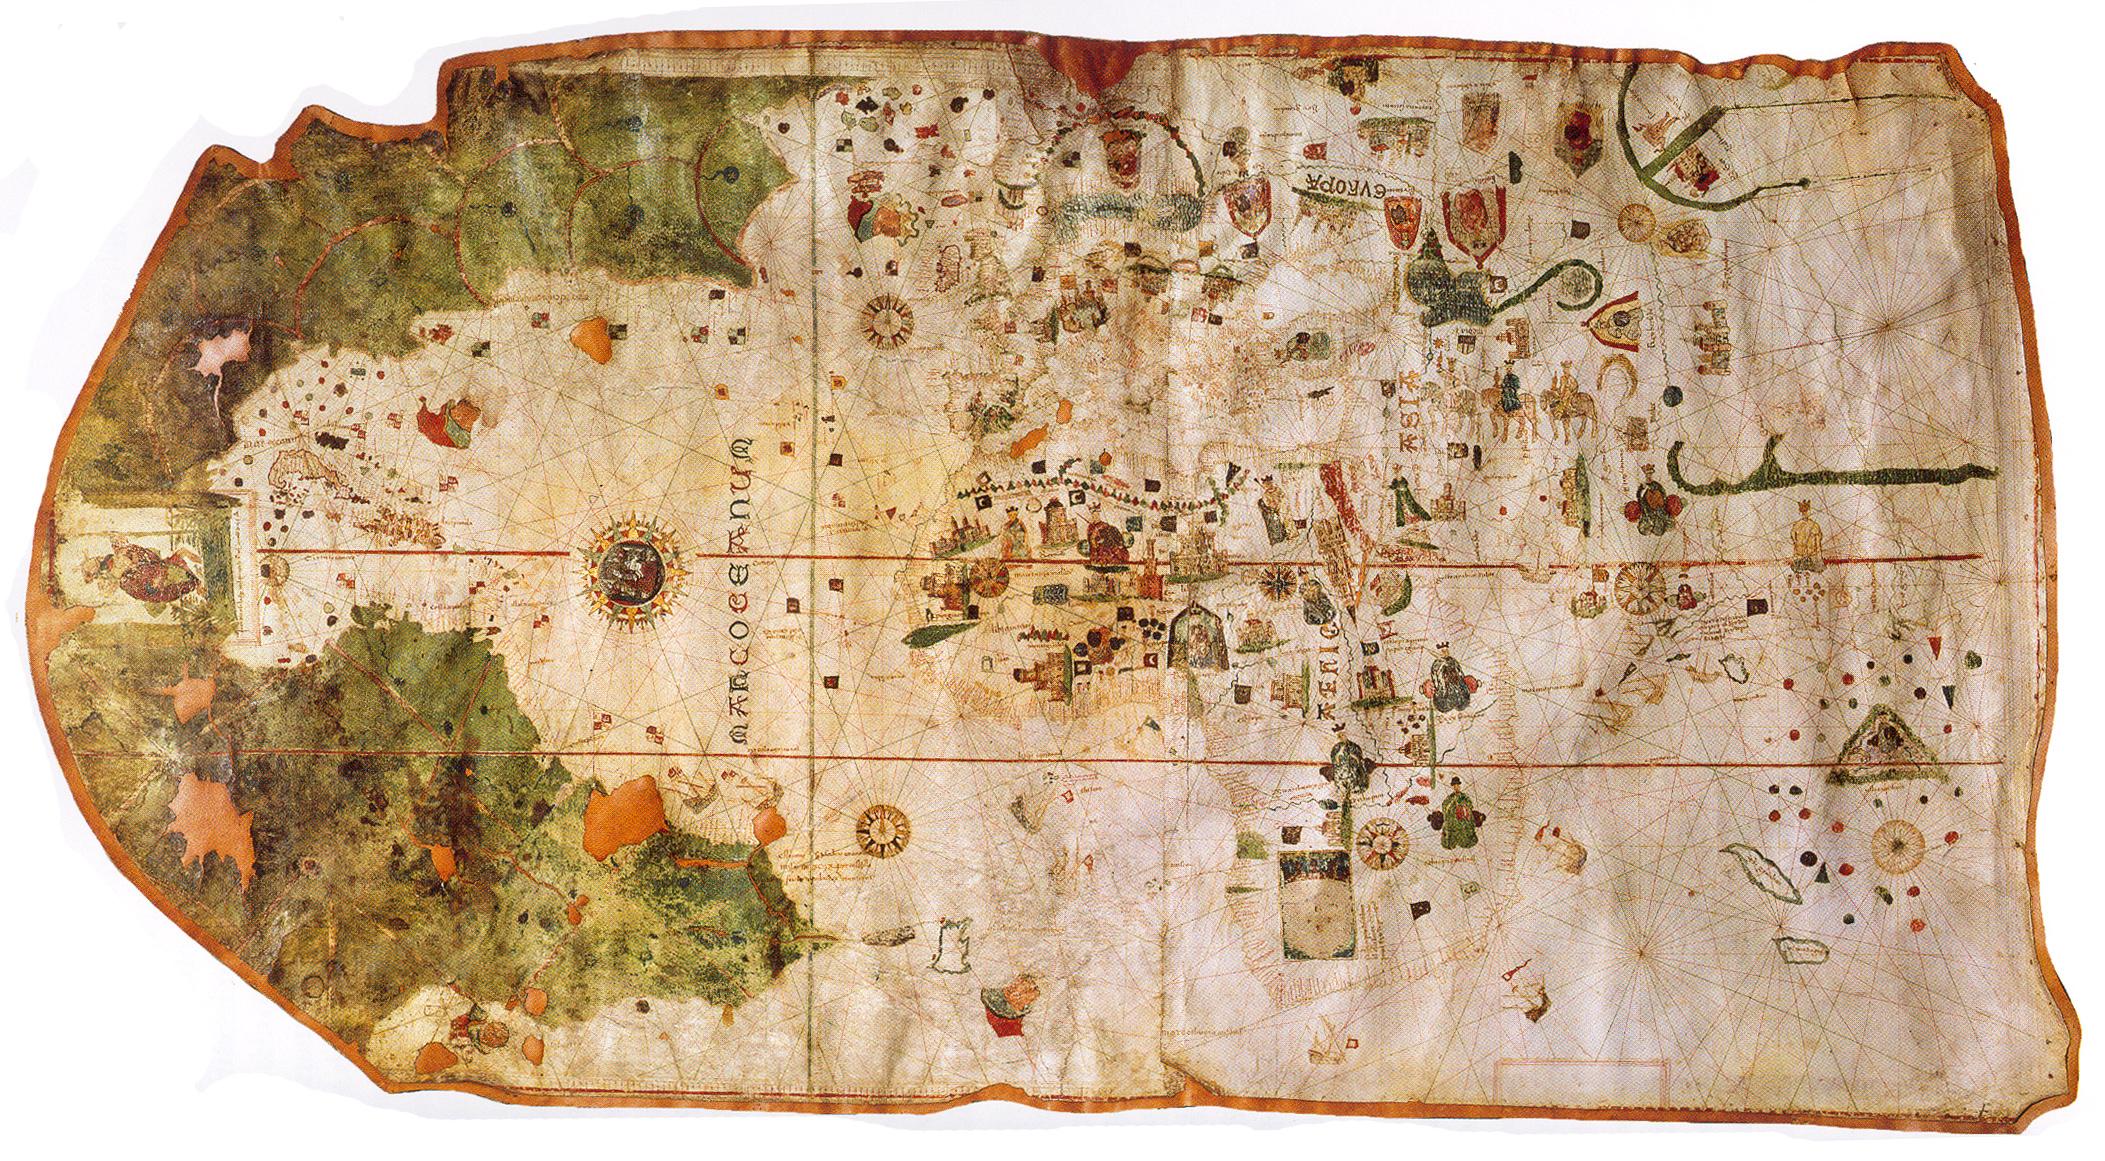 Weltkarte von Juan de la Cosa. (Quelle: via Wikimedia Commons, gemeinfrei)